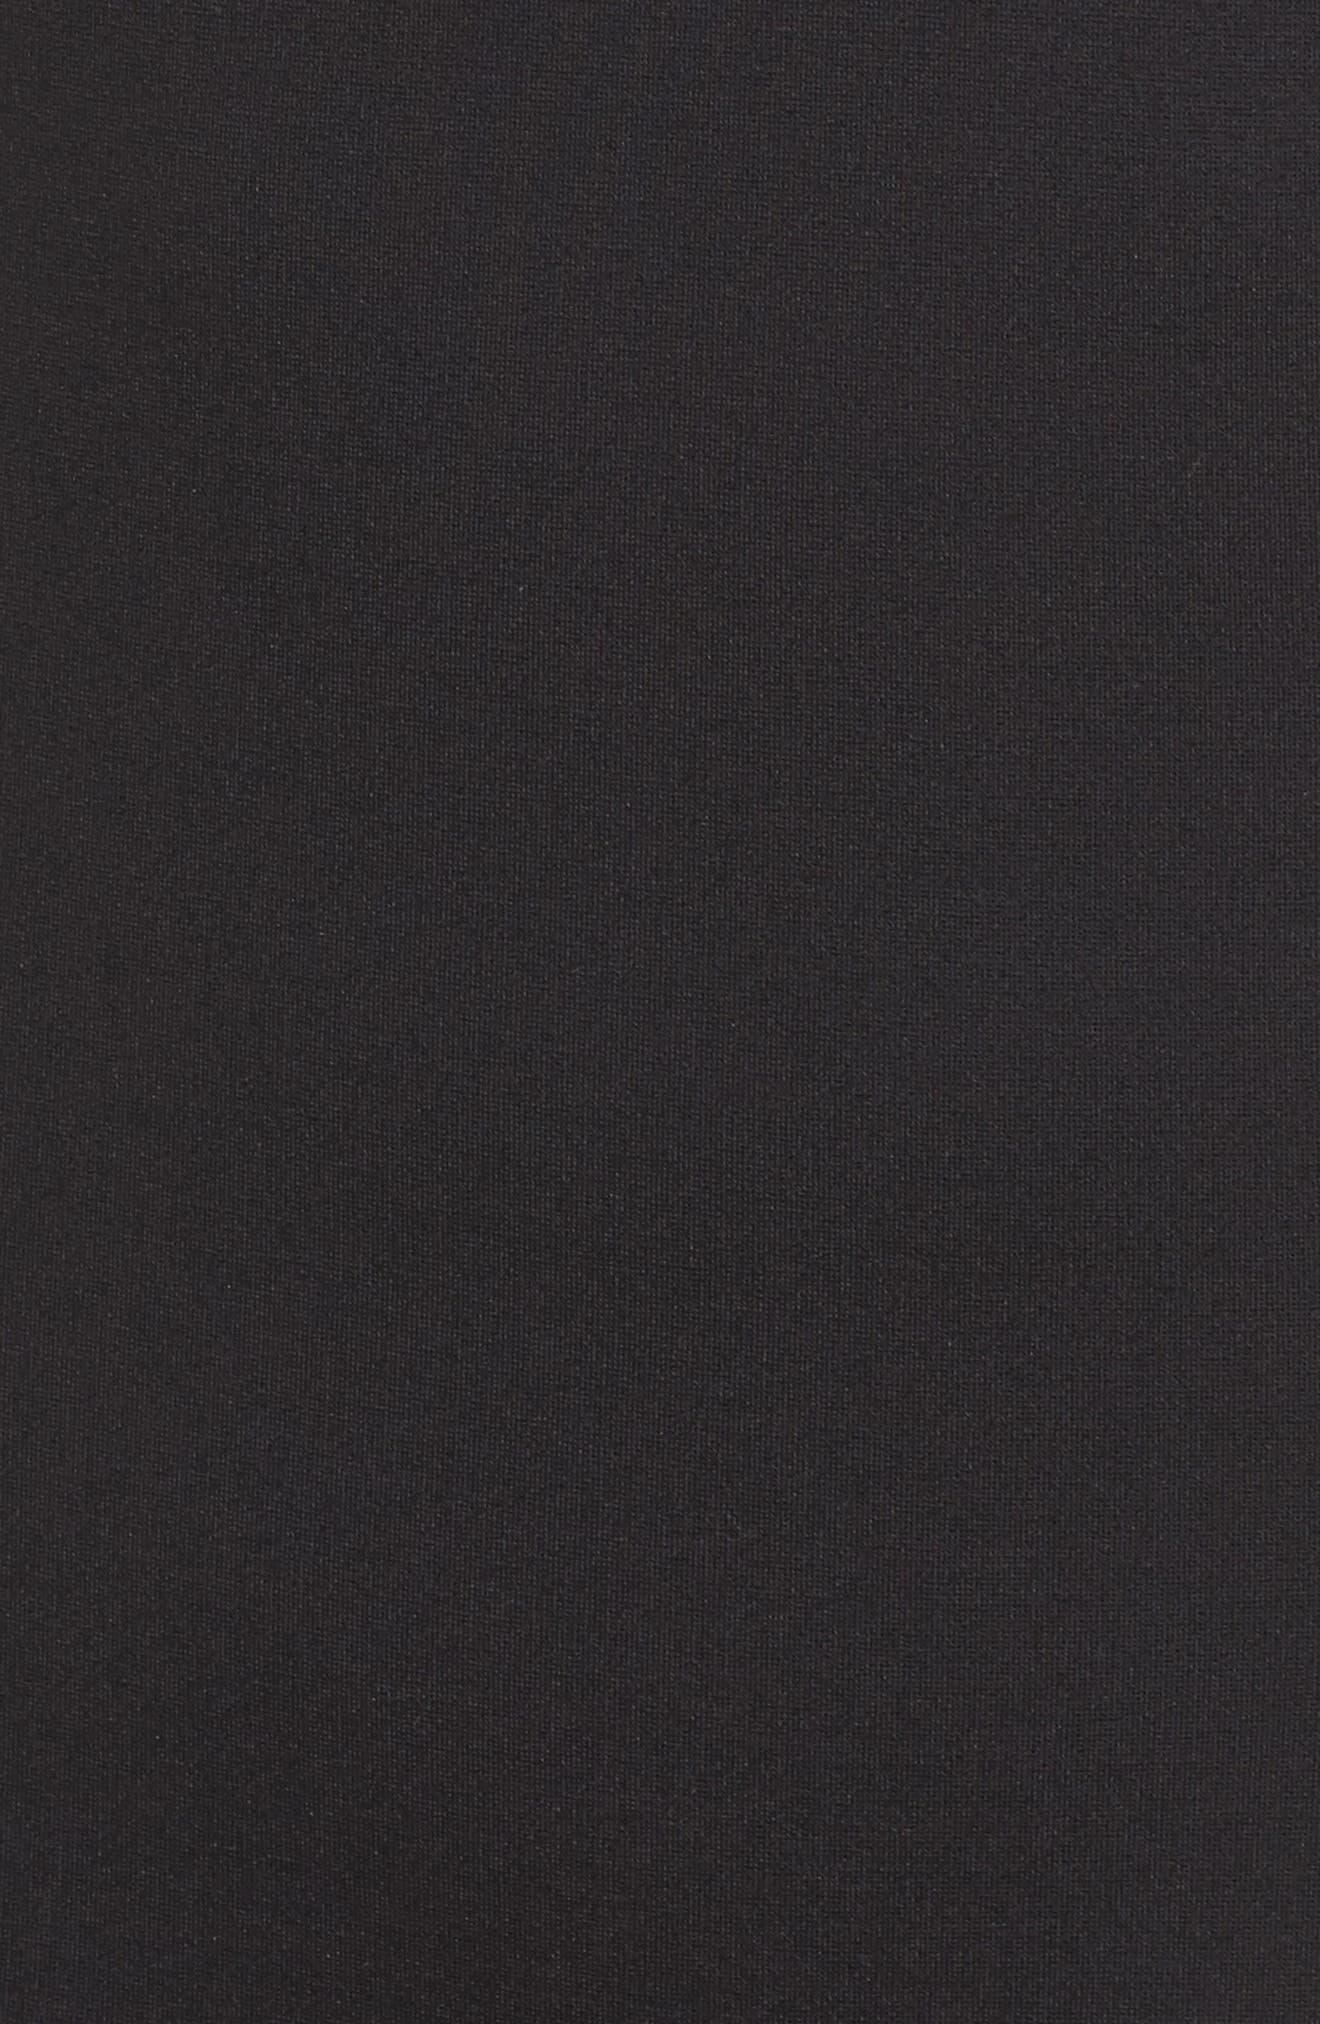 Pepa Mock Neck Sheath Dress,                             Alternate thumbnail 6, color,                             001